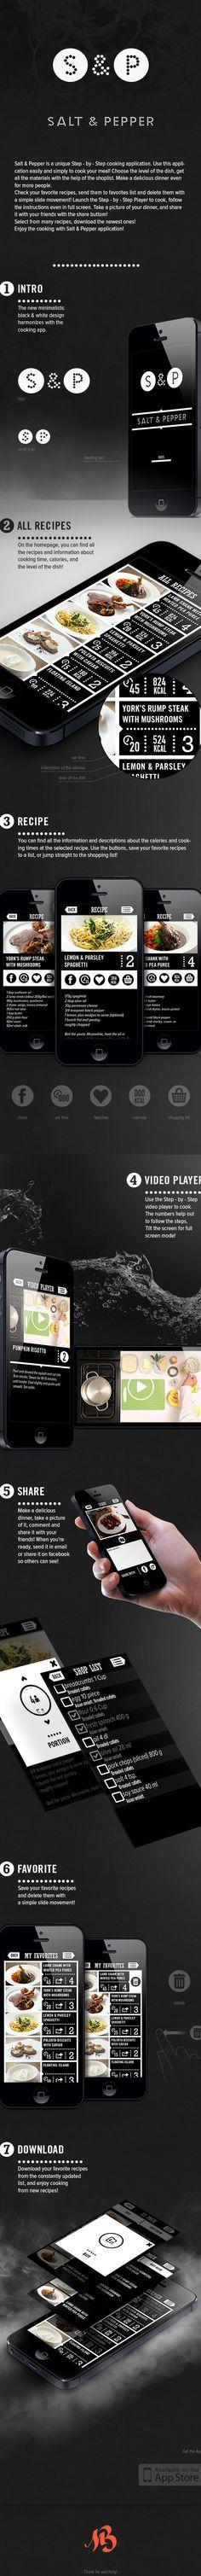 Salt & Pepper - app by Magyar Balázs, via Behance